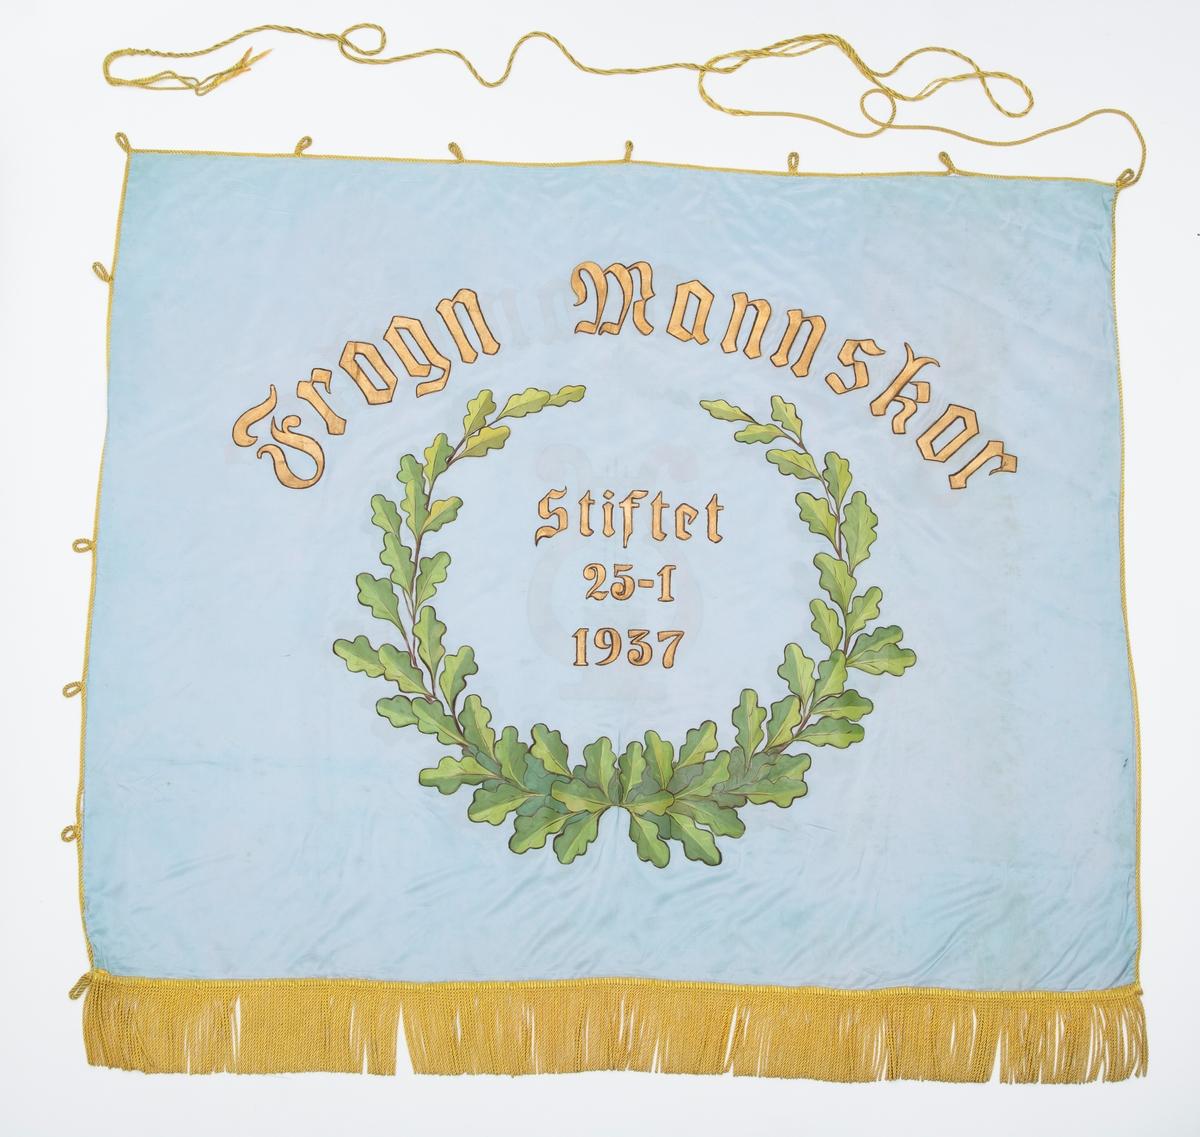 Lyseblå banner med eikebladmotiv. Gule frynser, bardunsnor og dusker. A. Banner B. Styresnor C. Bardunsnor D. Bandolær E. Bærestang (topp del) F. Bærestang (nederste del) G. Råstang